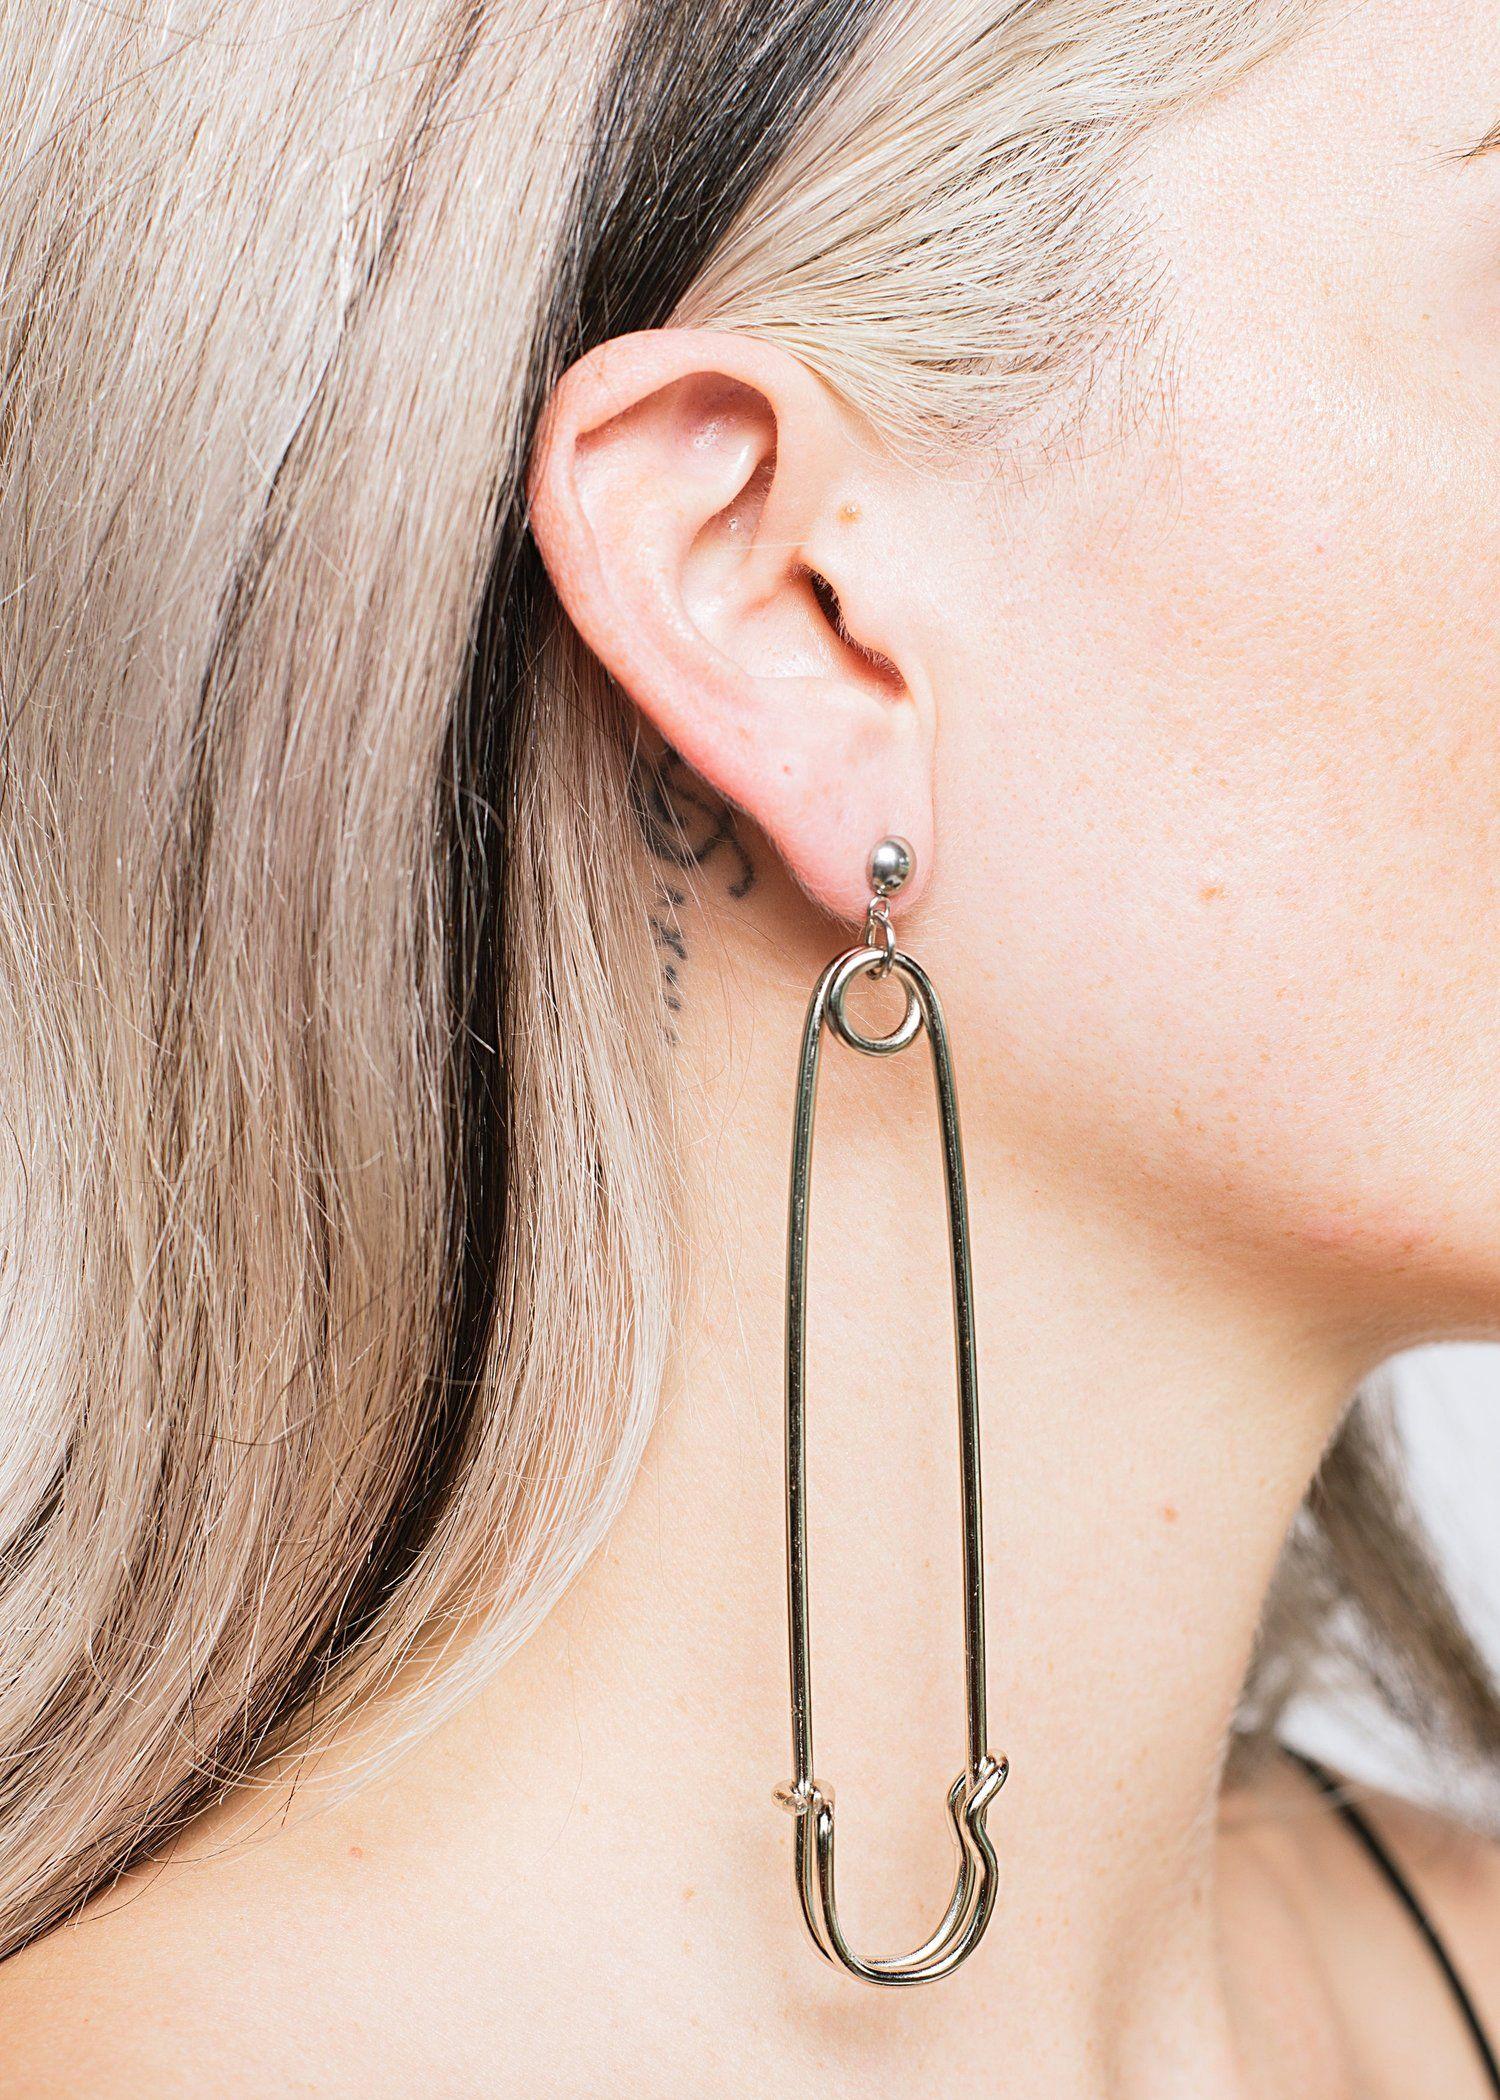 Gjonaj P Shopdalmata Ecom 153 Jpg Safety Pin Earrings Earrings Safety Pin